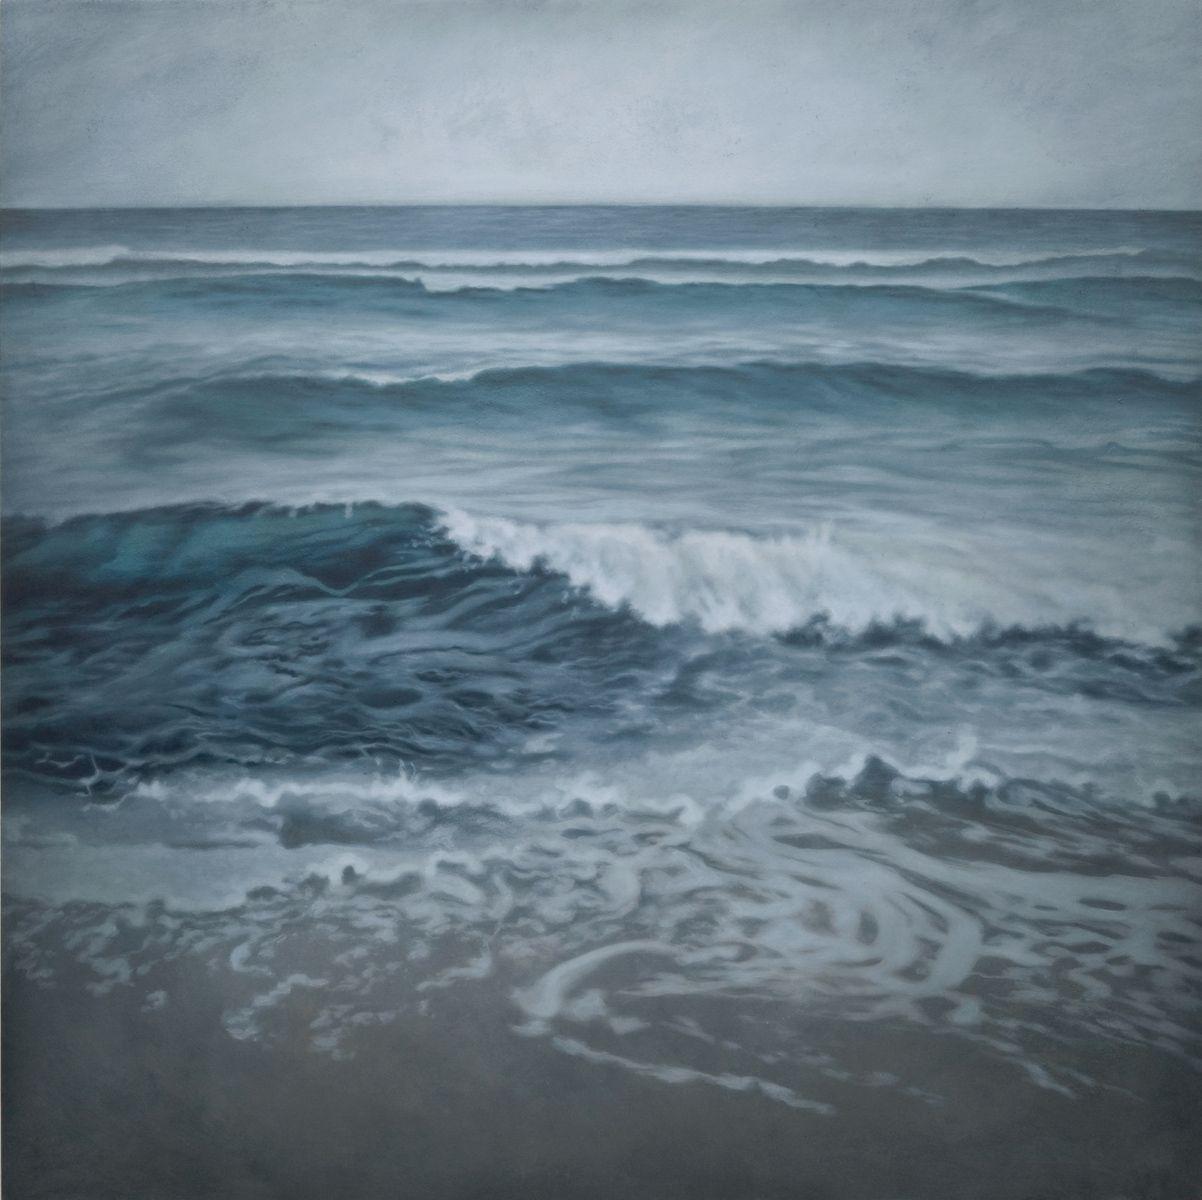 Seascape (Seagrove Beach)